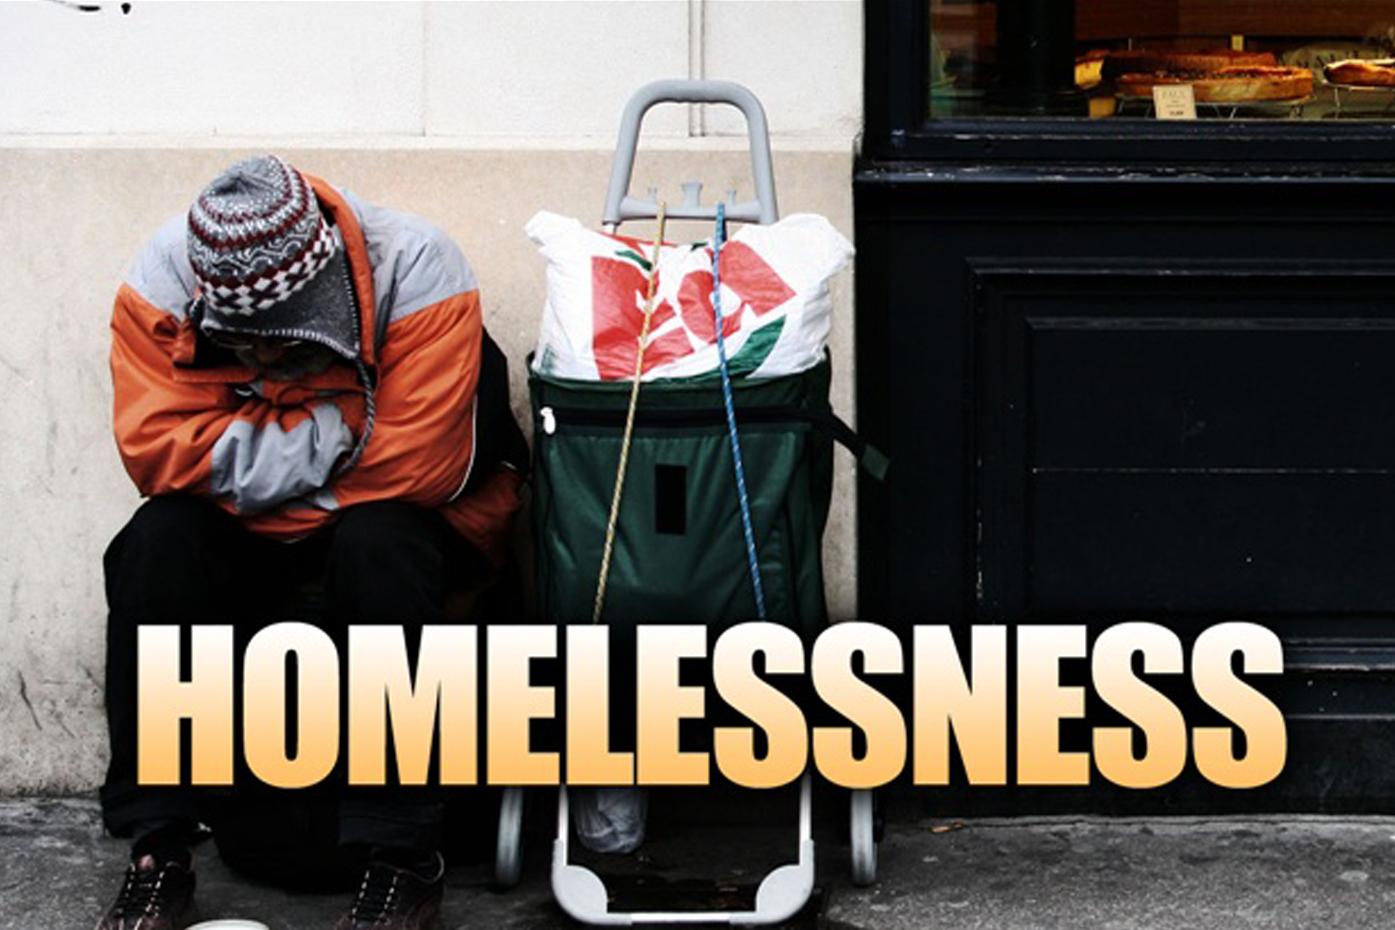 Homeless Person Against Wall_nbc_plas_1453850456360.jpg